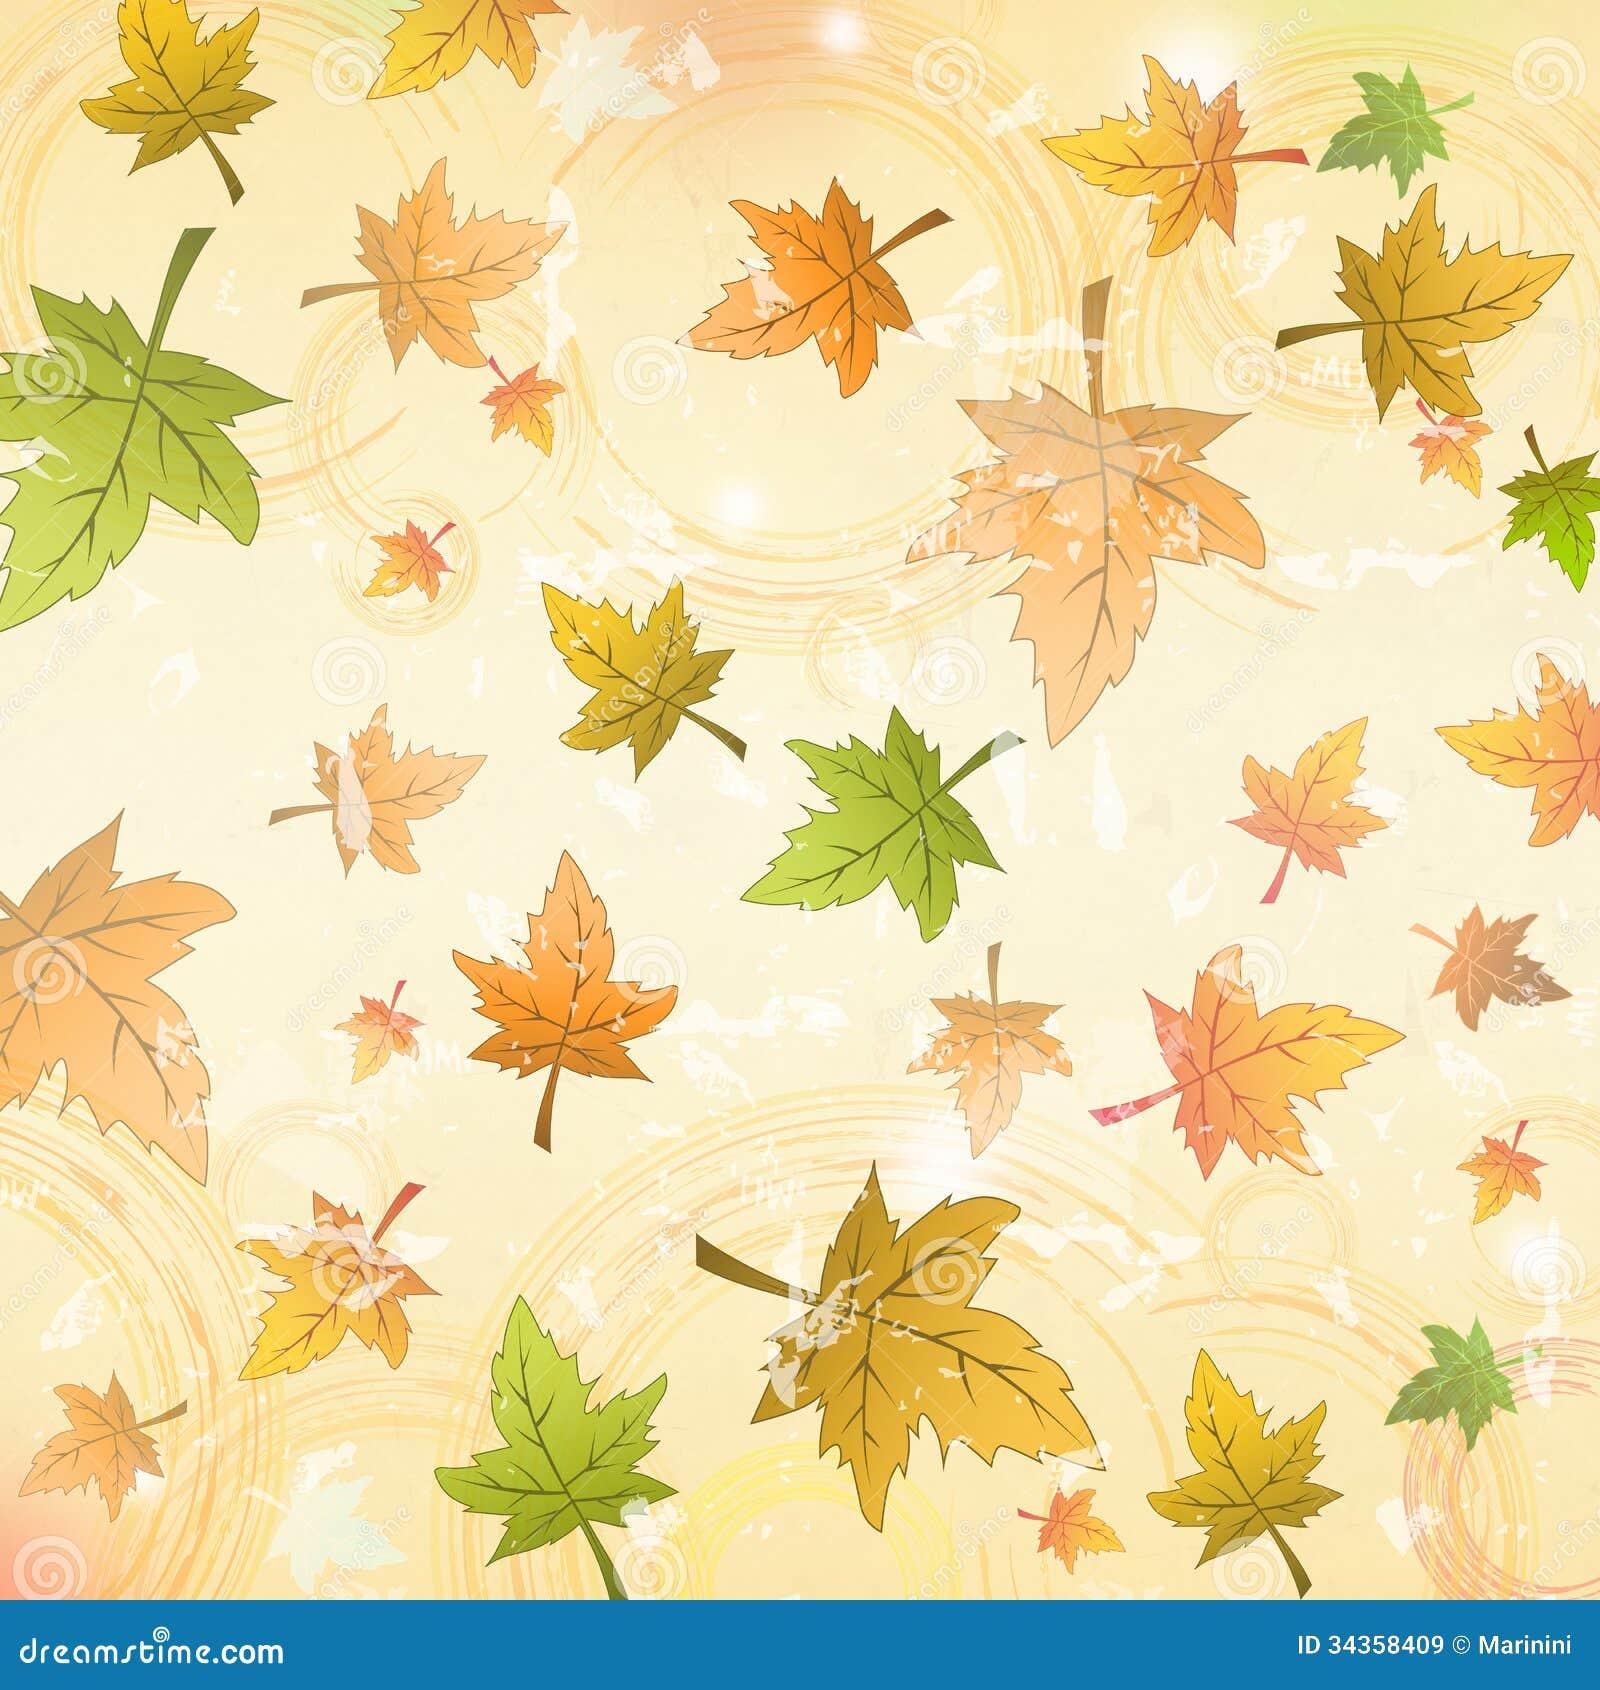 Fall Leaves Wallpaper Vector